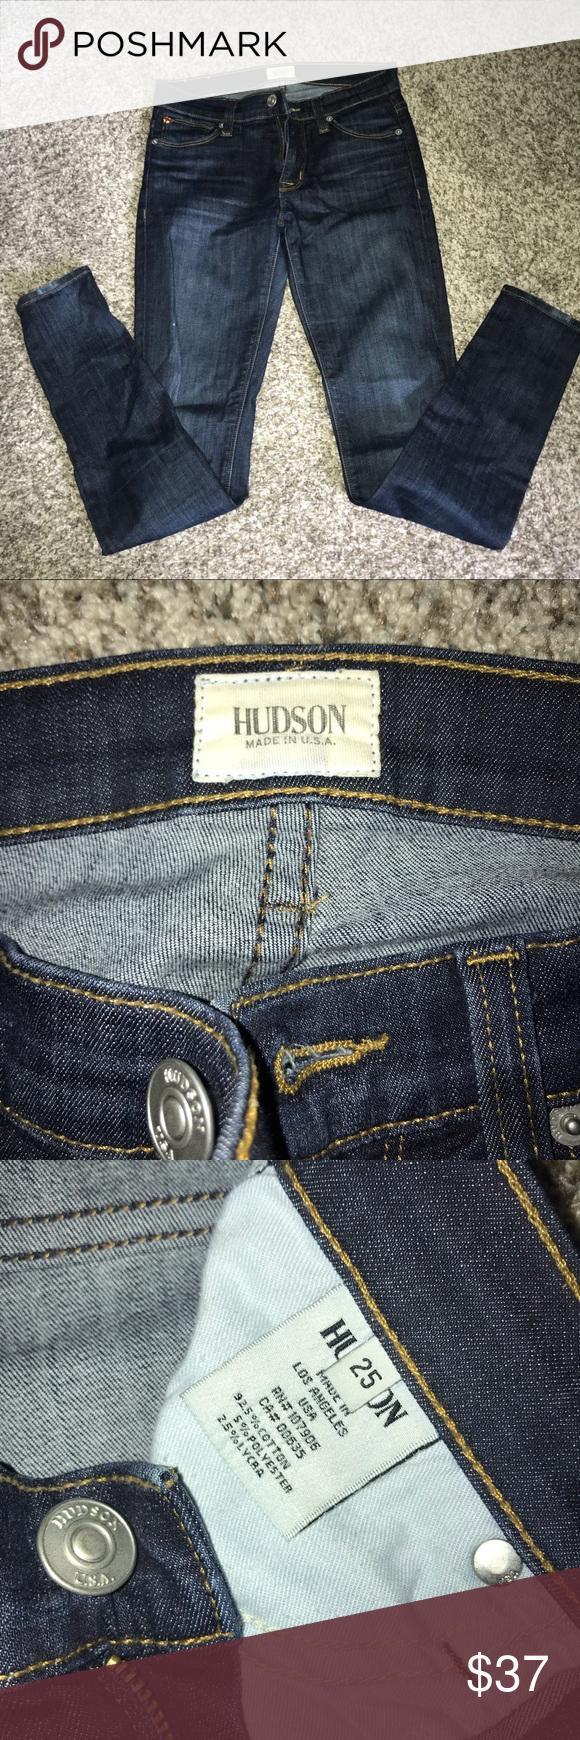 Hudson jeans 25